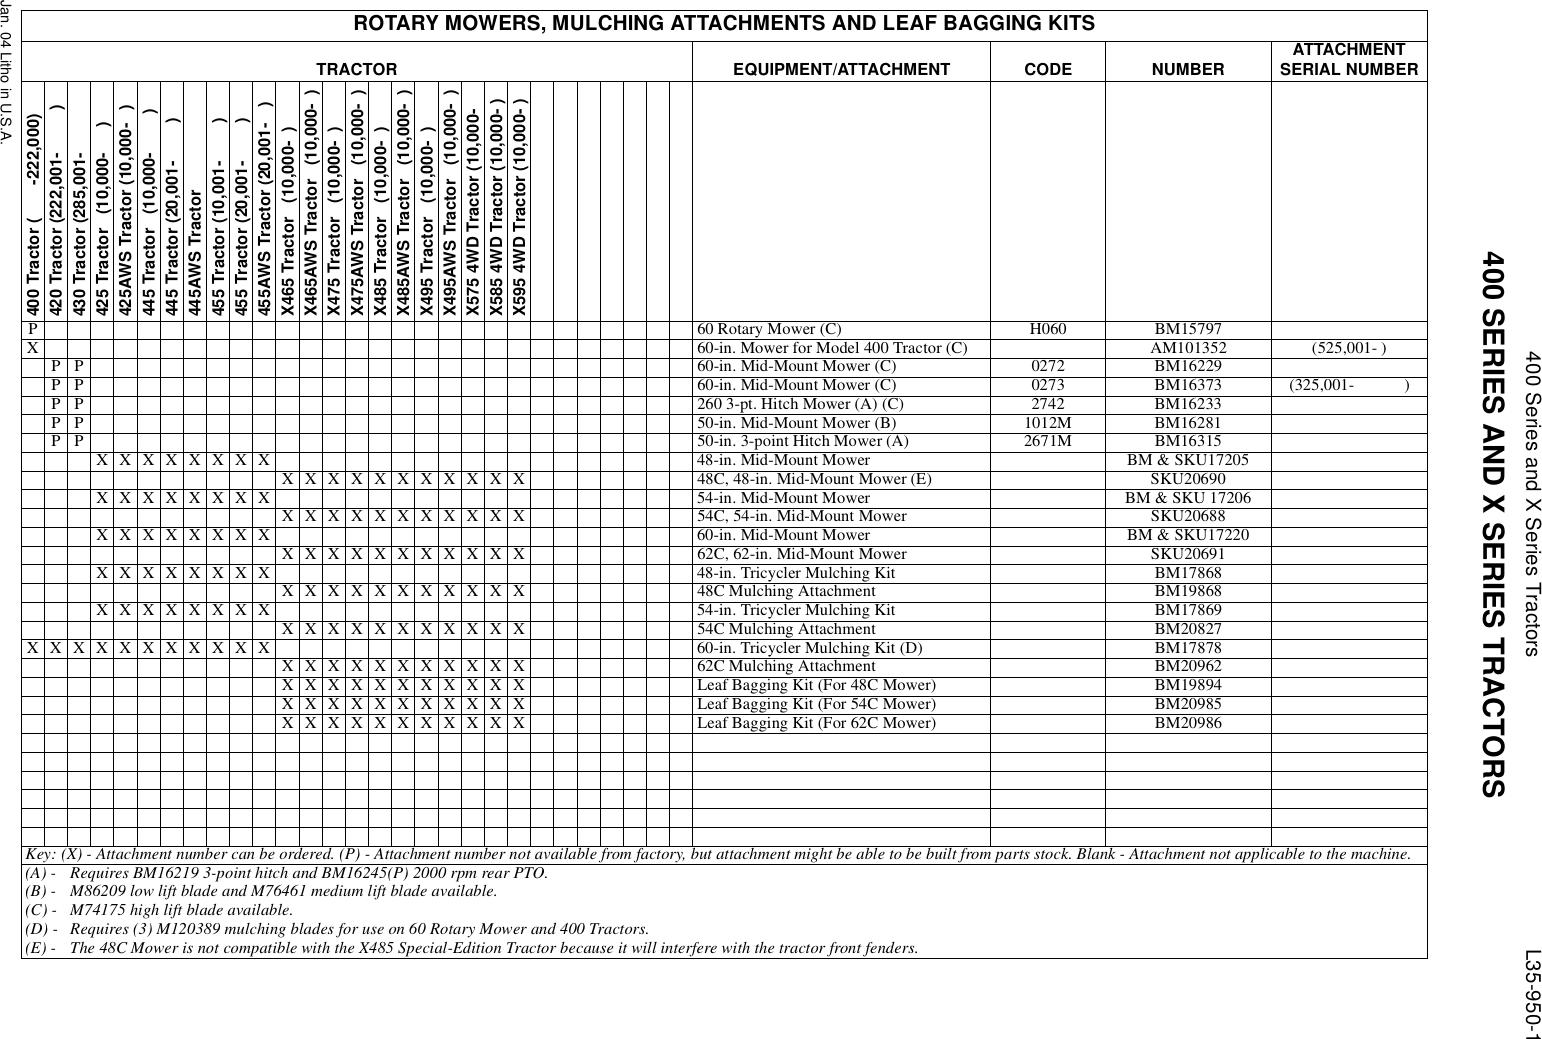 L35g950lgc 400 X595 John Deere Attachment Tractor 425 Wiring Harness Interchangeability Dated Jan04 Interchangeabilitydated